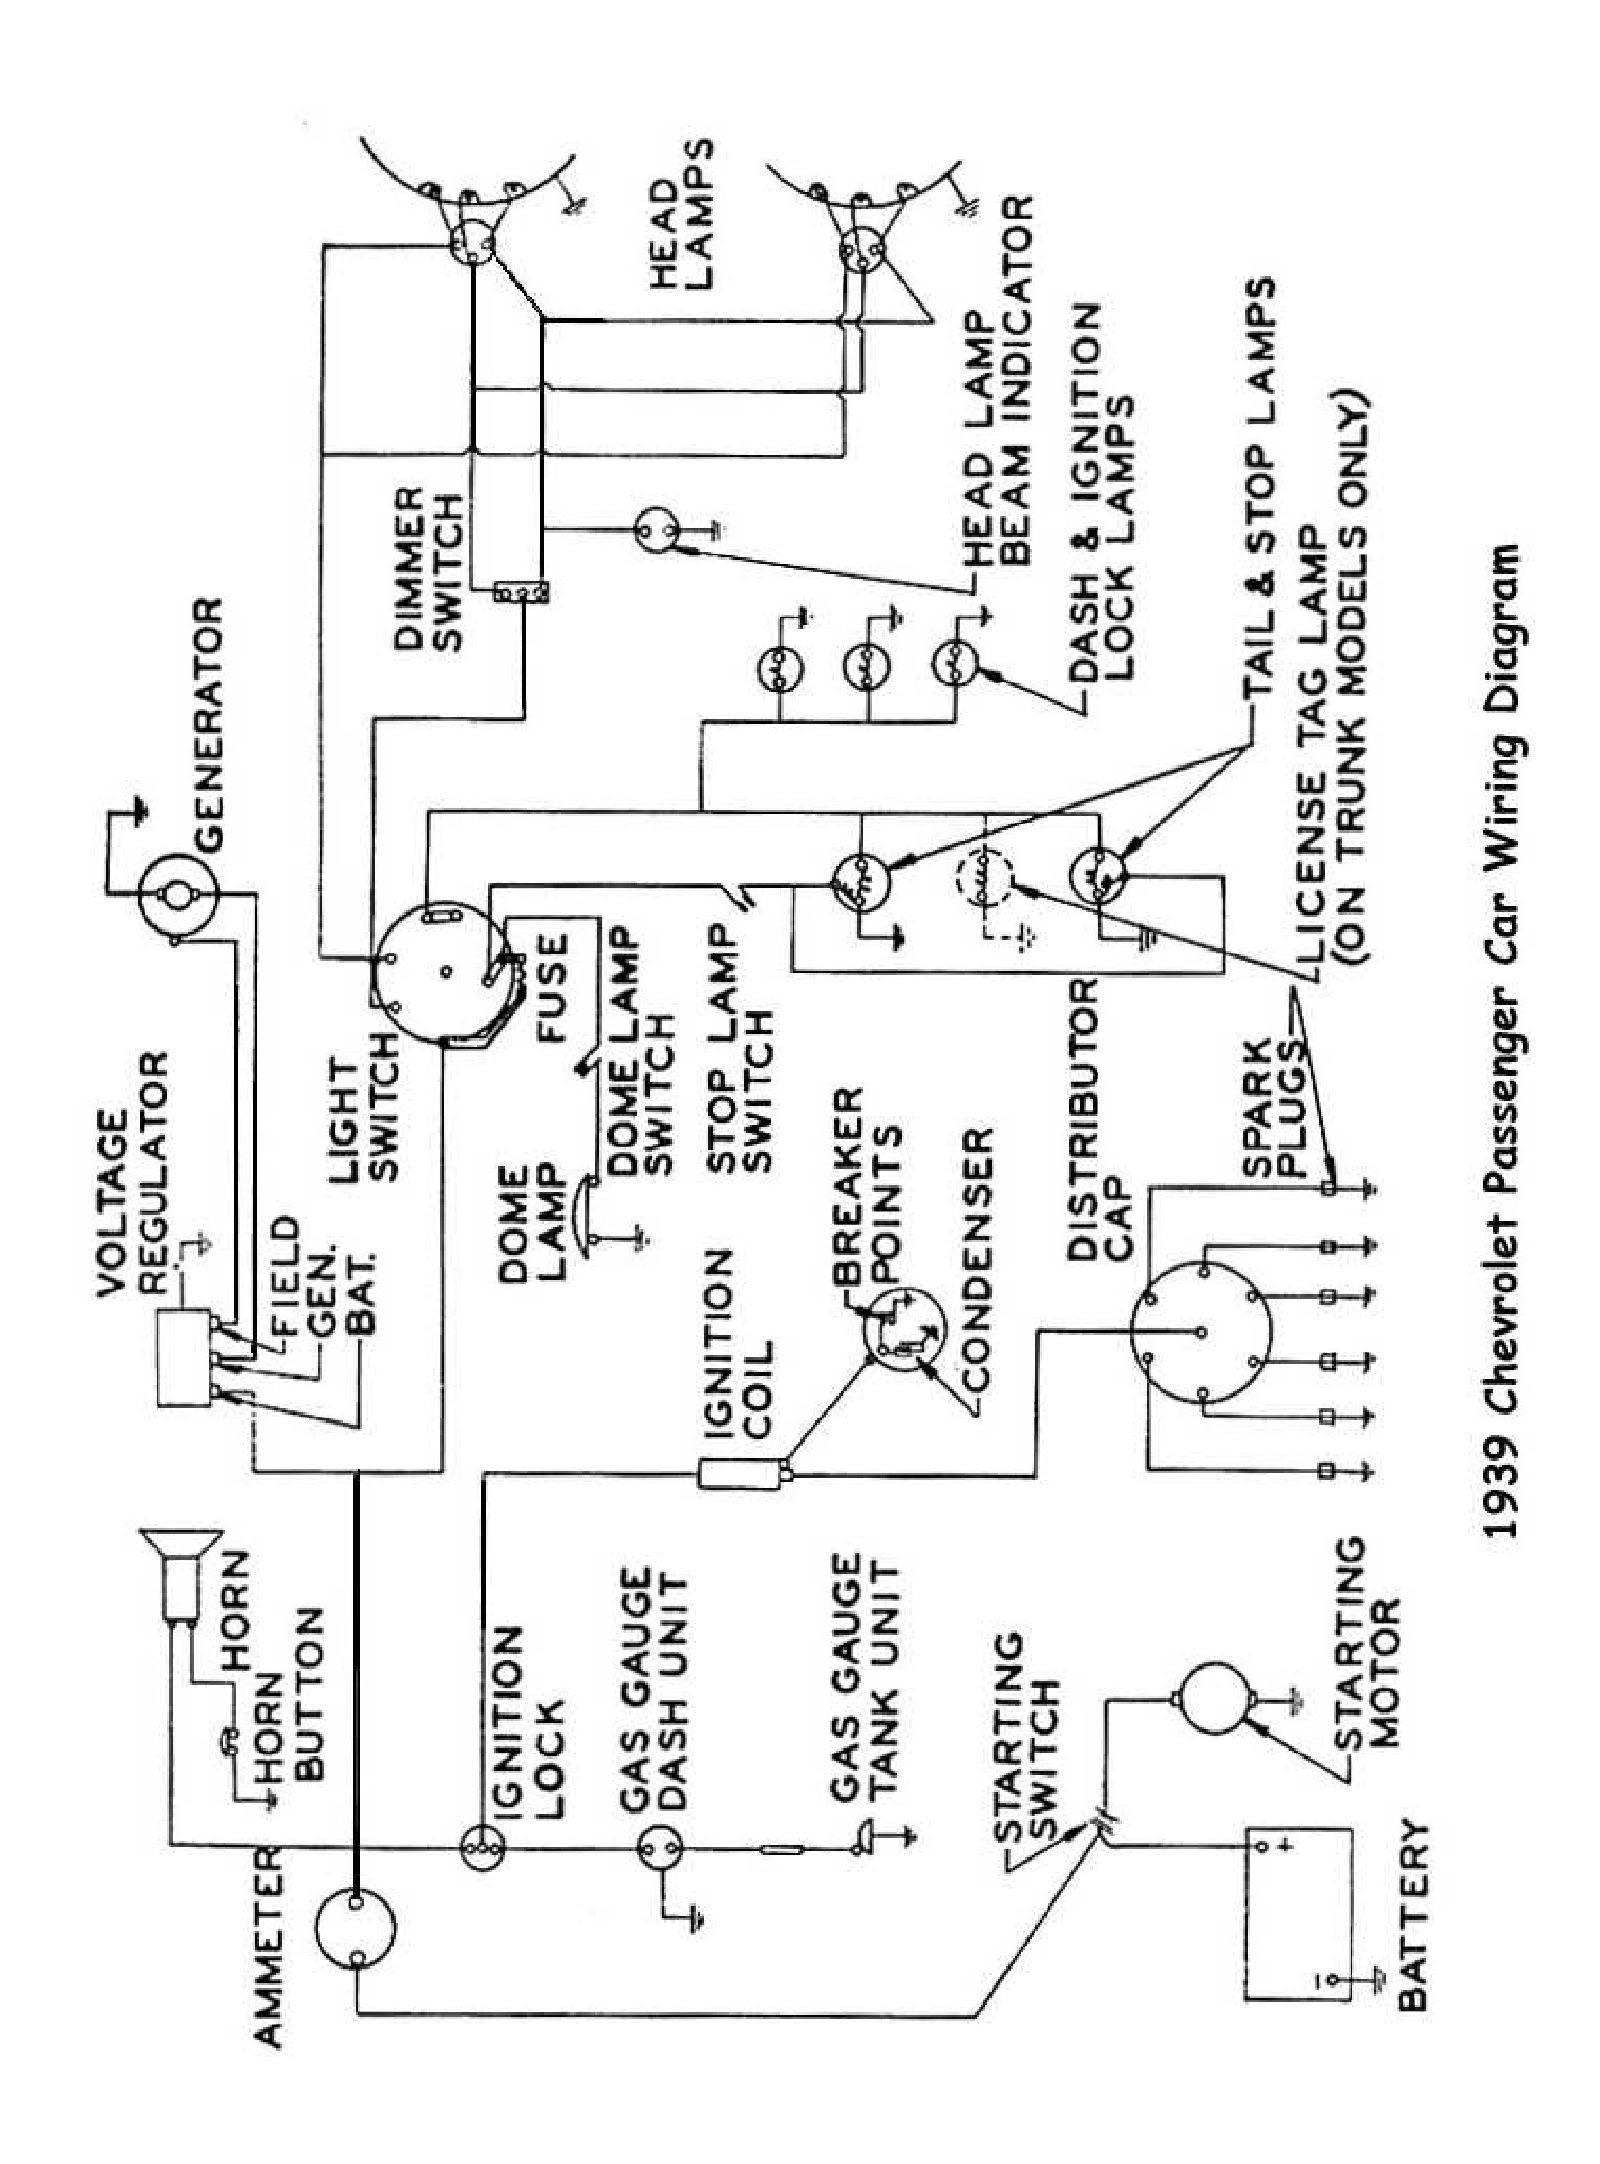 Diagram Wiring Diagram 1951 Chevy Belair Full Version Hd Quality Chevy Belair Airplanewiring Biorygen It